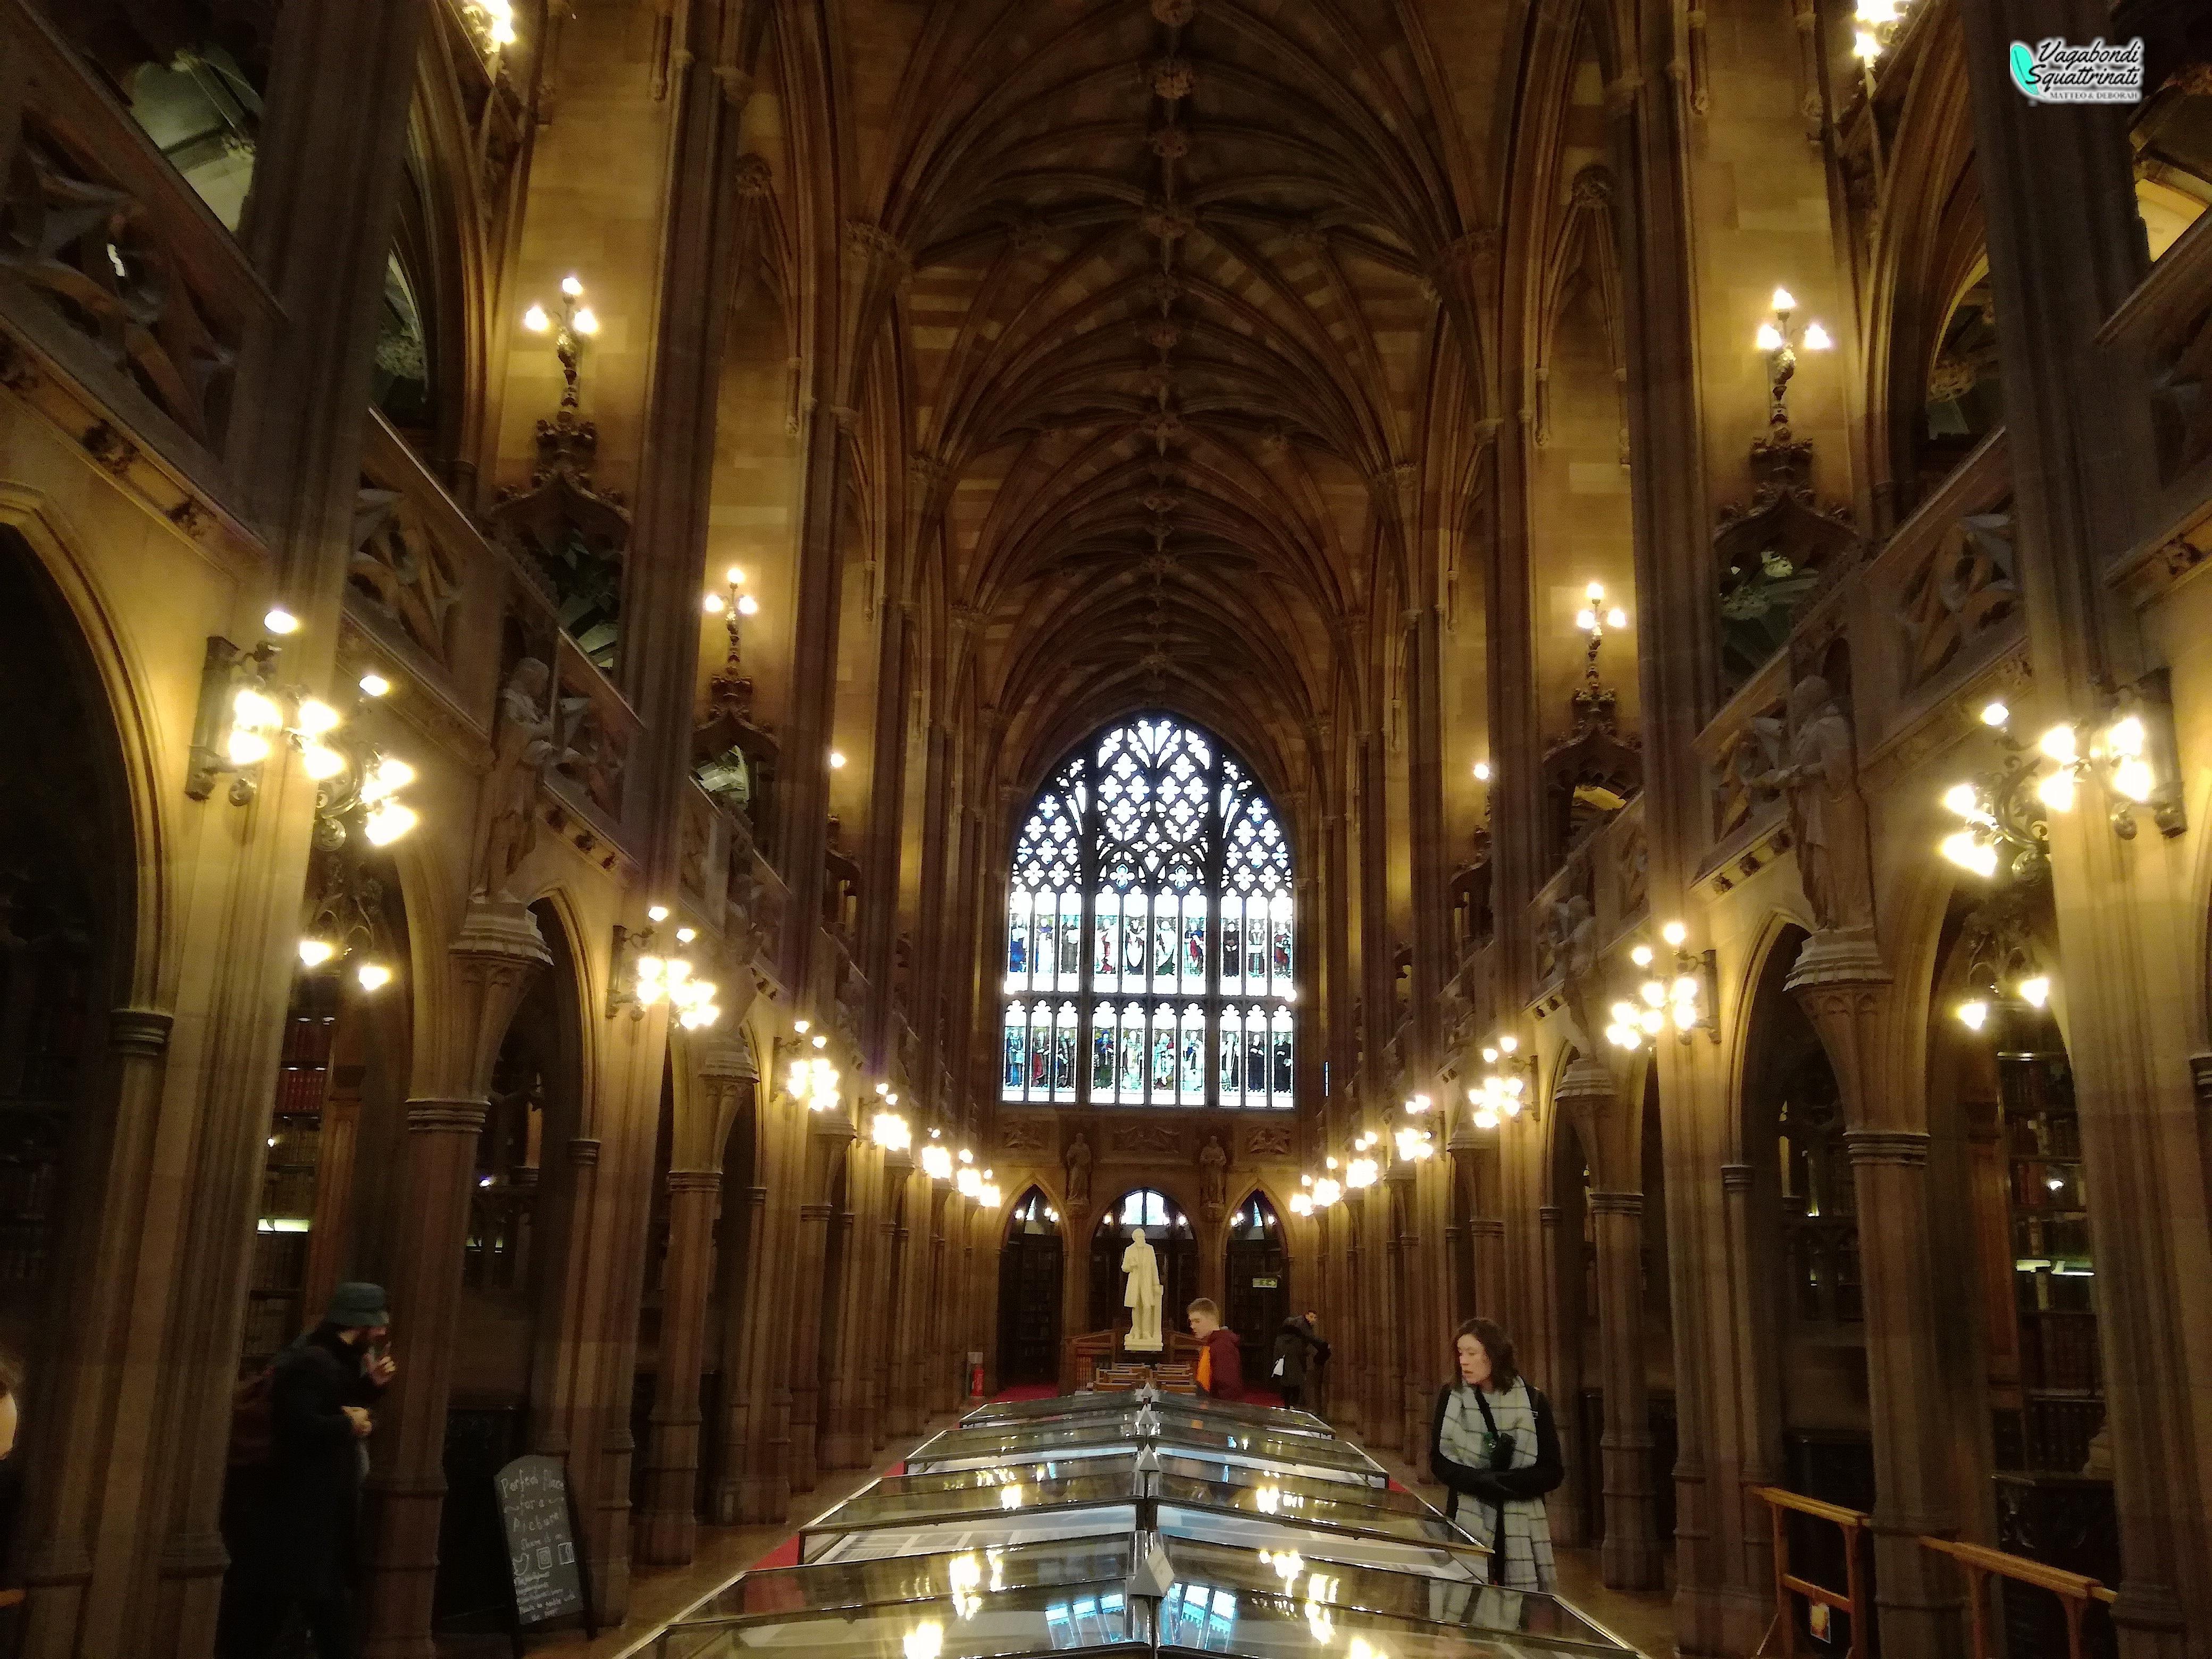 10 cose da non perdere a Manchester John Rylands library